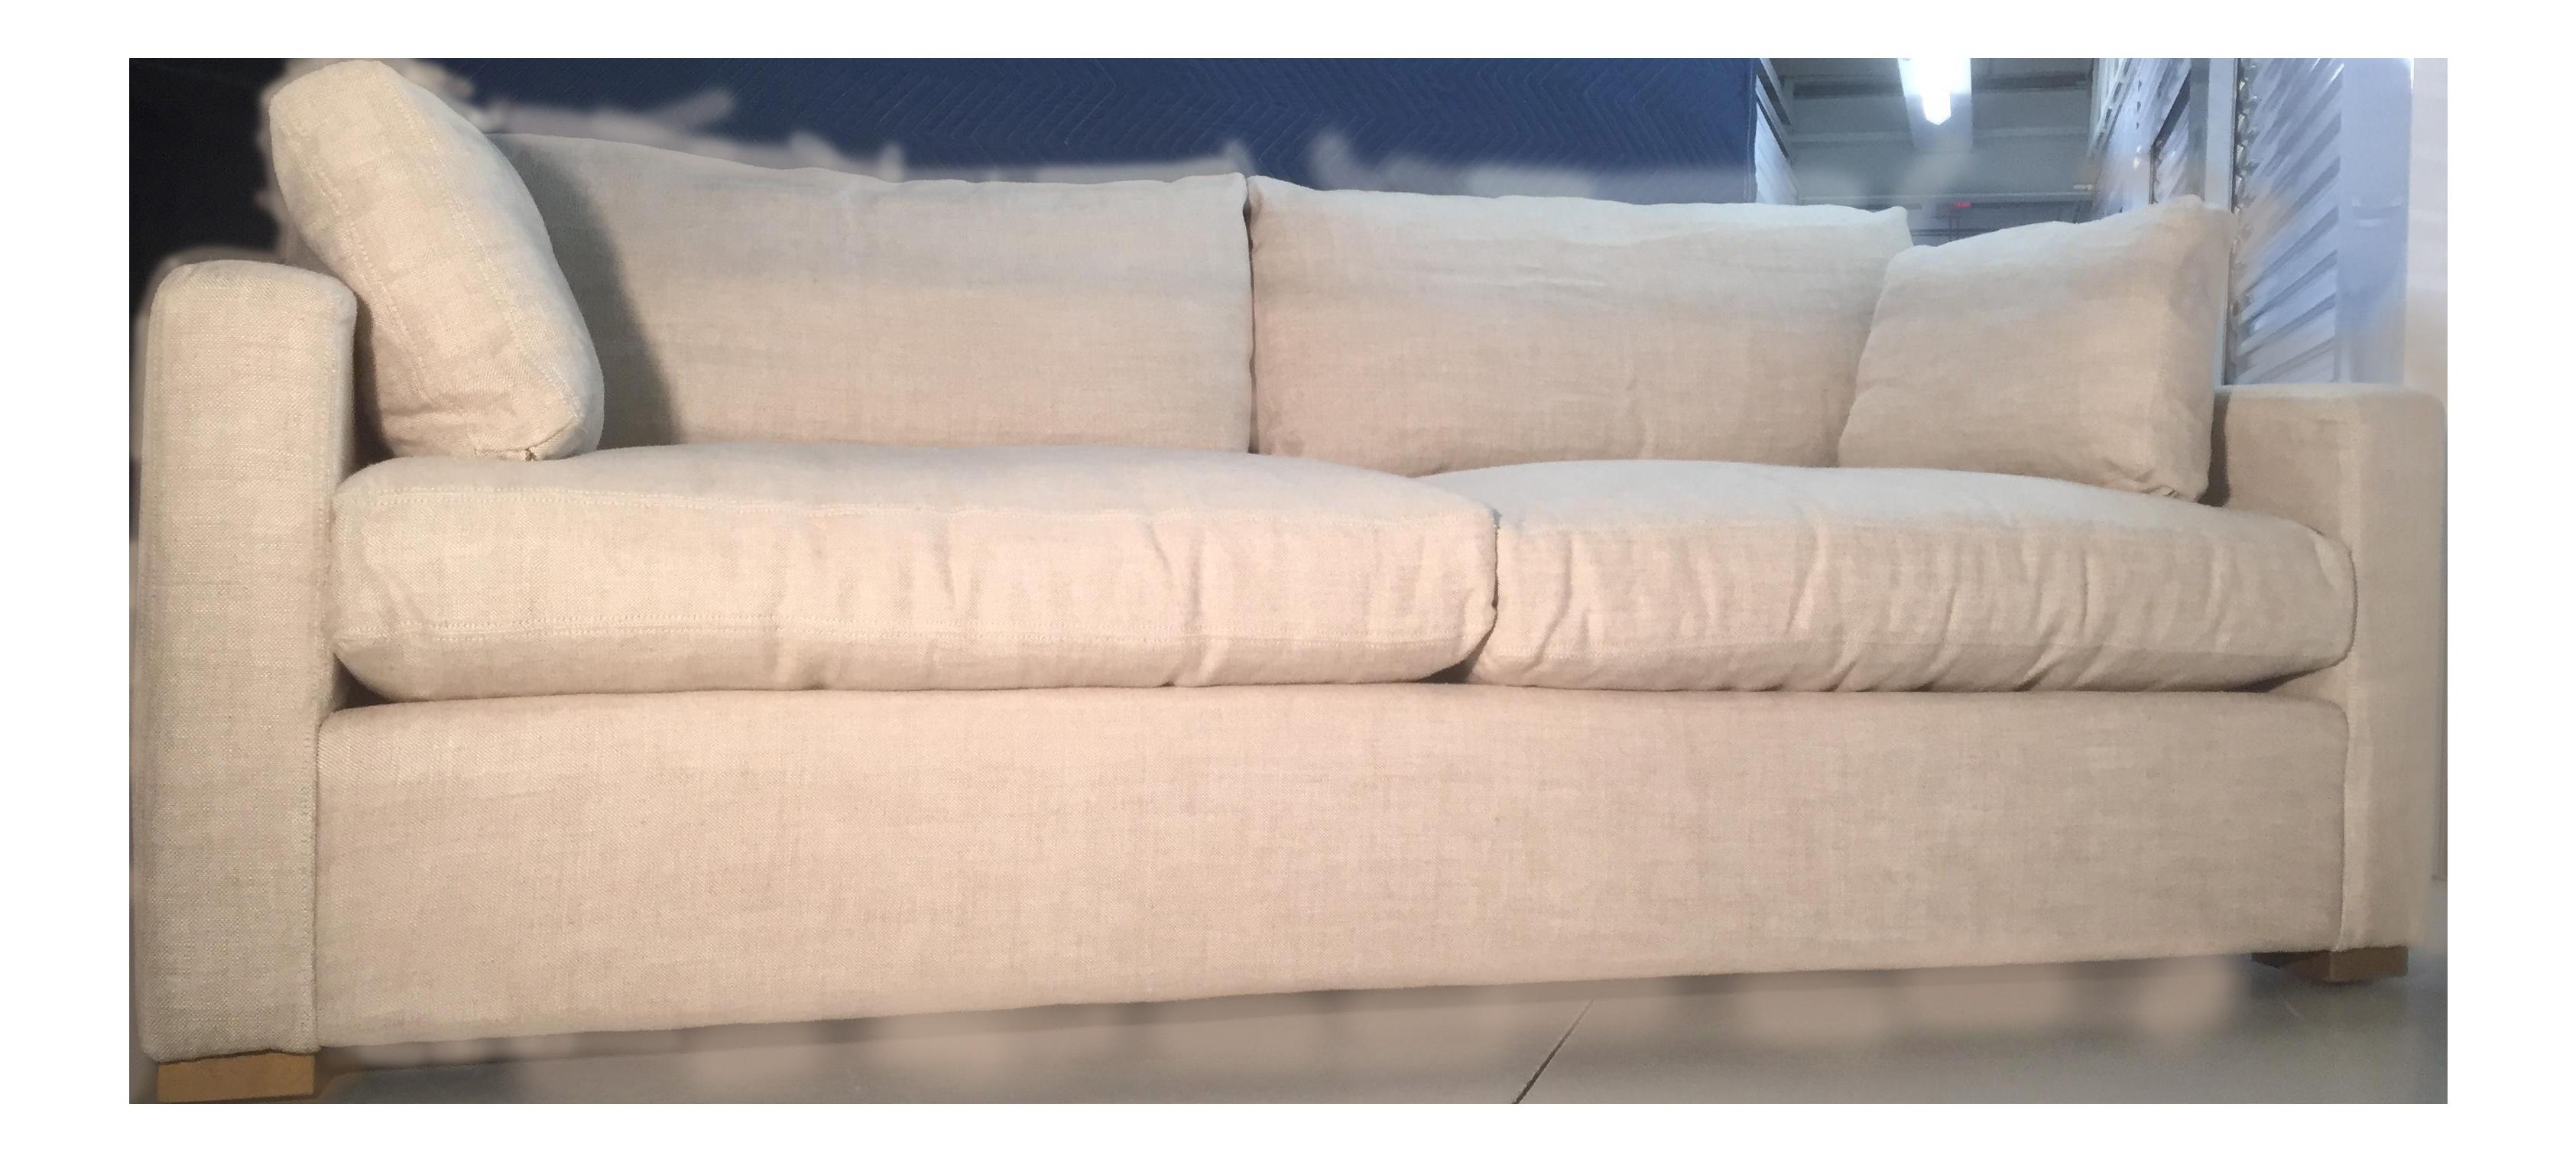 Restoration Hardware Belgian Track Arm Upholstered Down Sofa